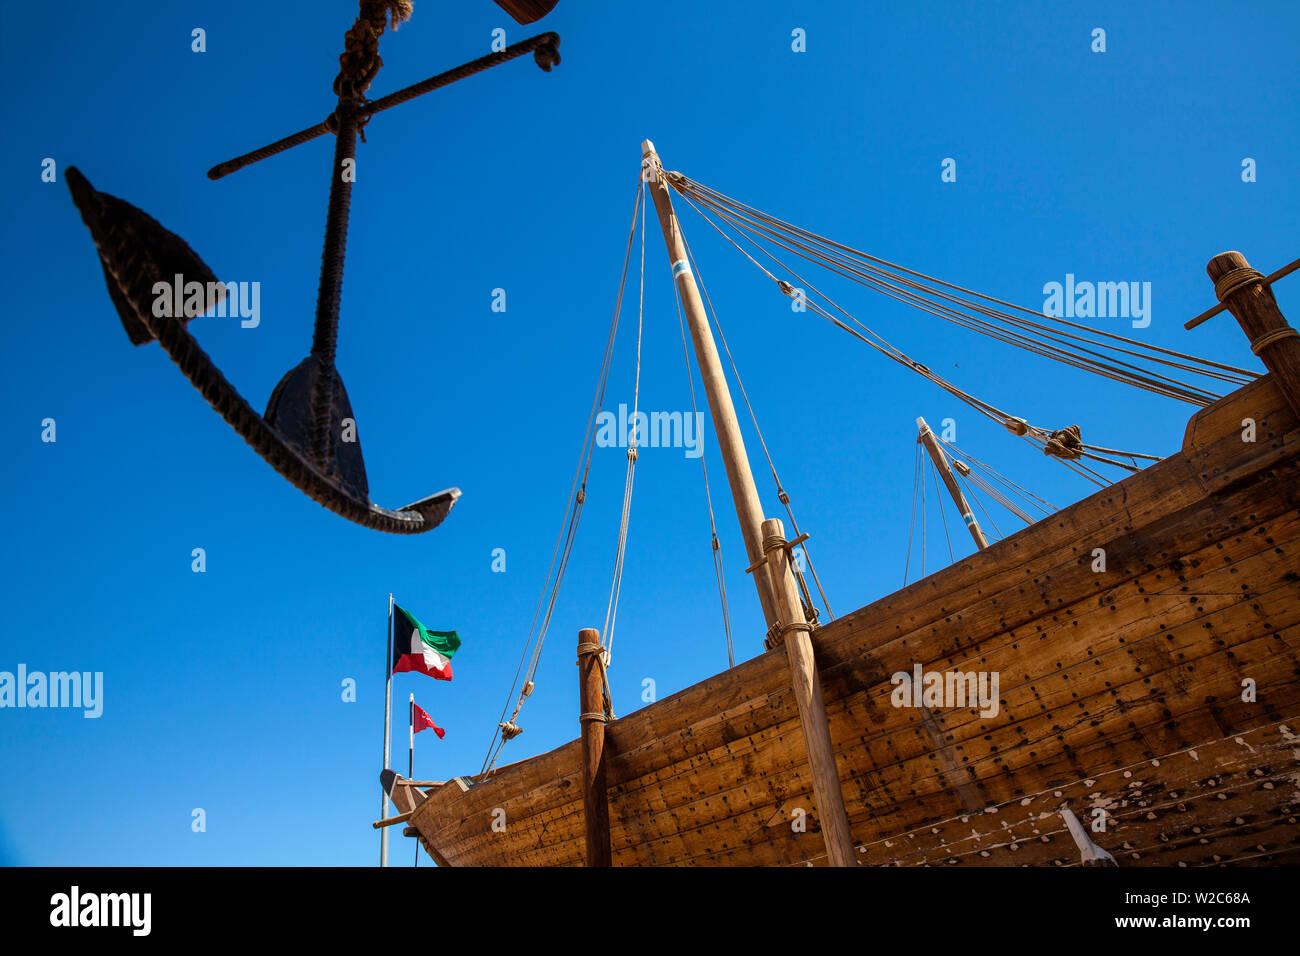 Kuwait, Kuwait City, Maritime museum - Stock Image